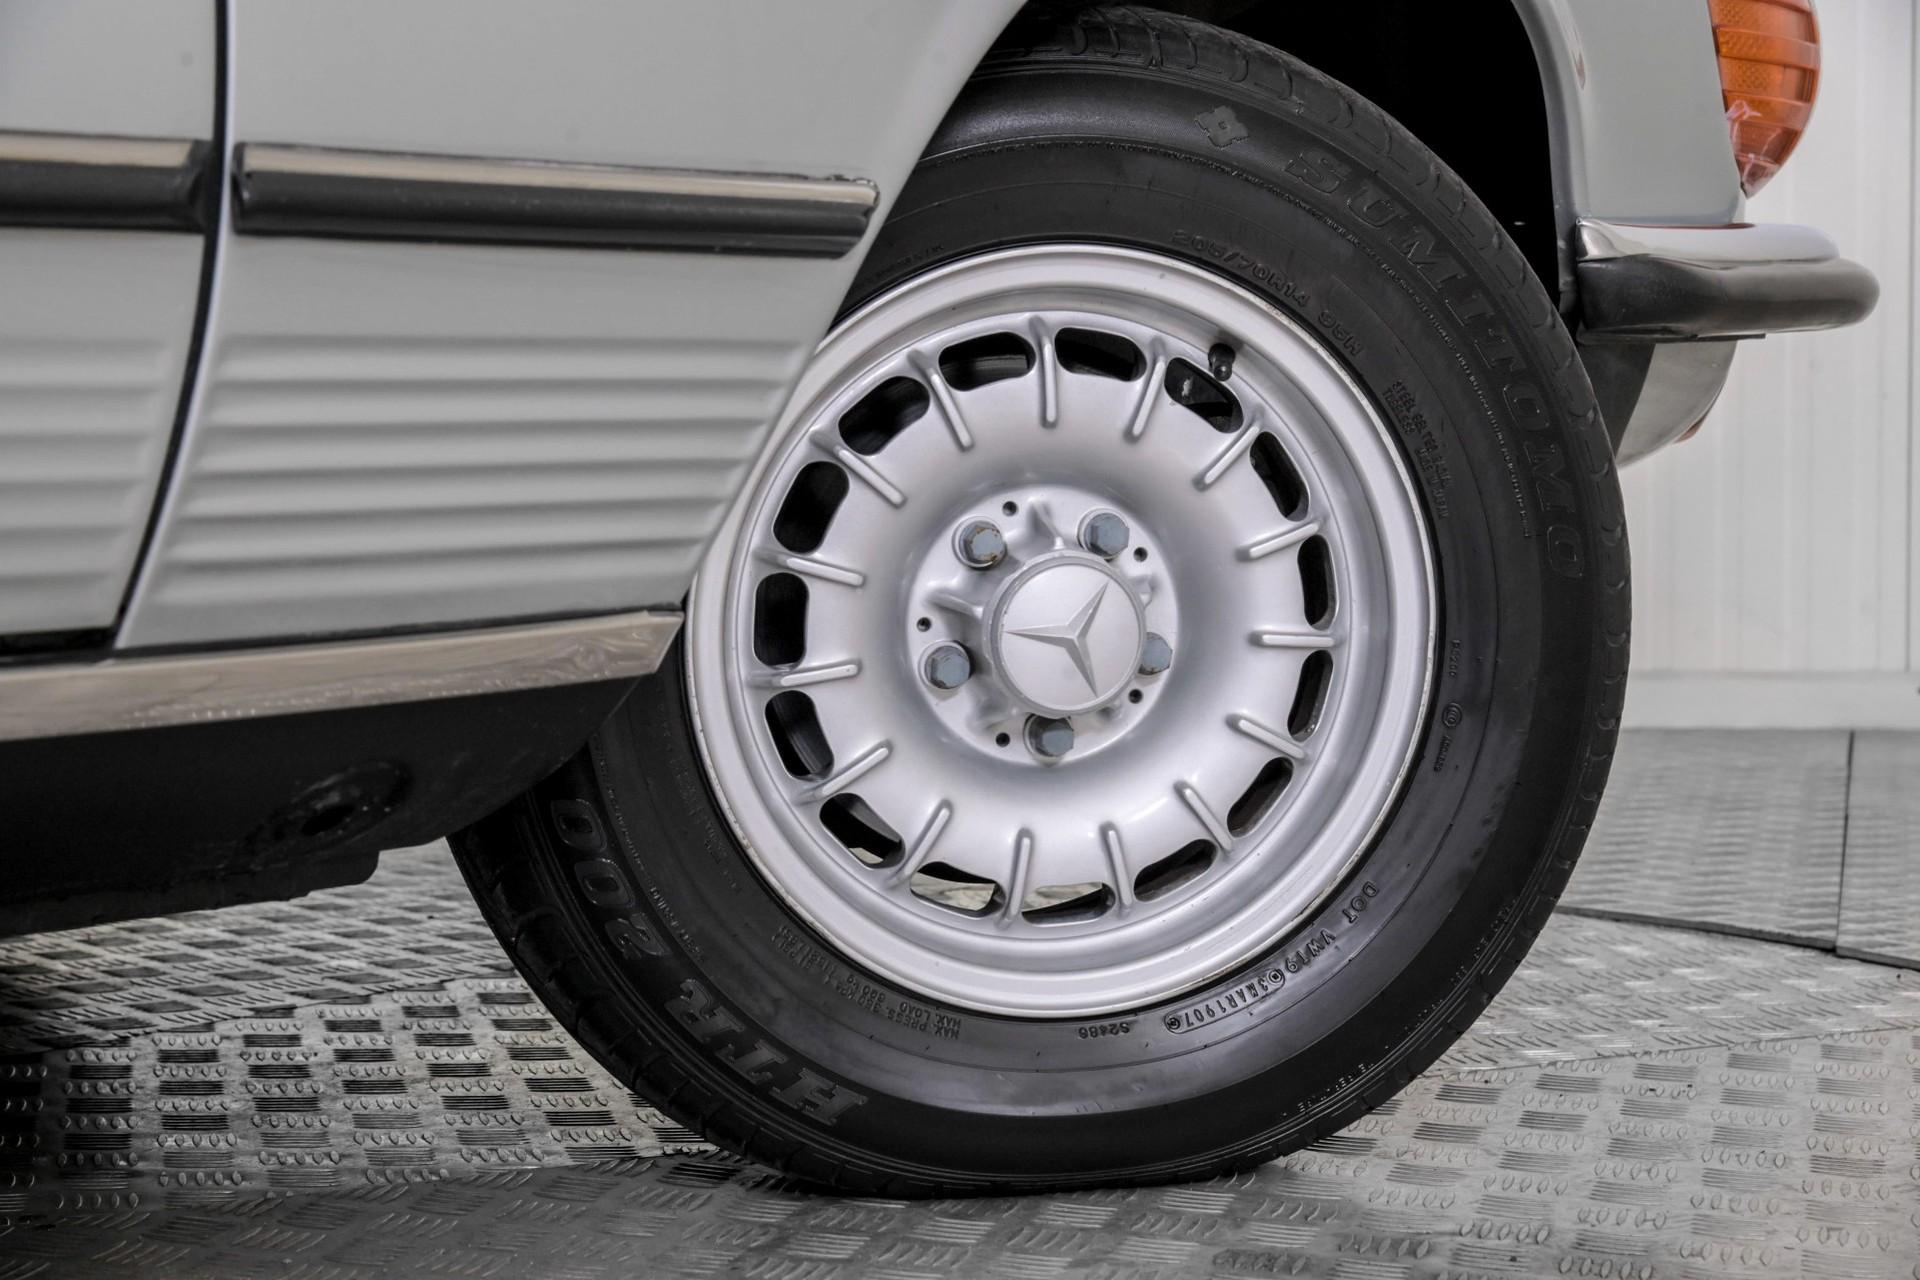 Mercedes-Benz SL-Klasse 450 SL roadster Foto 53